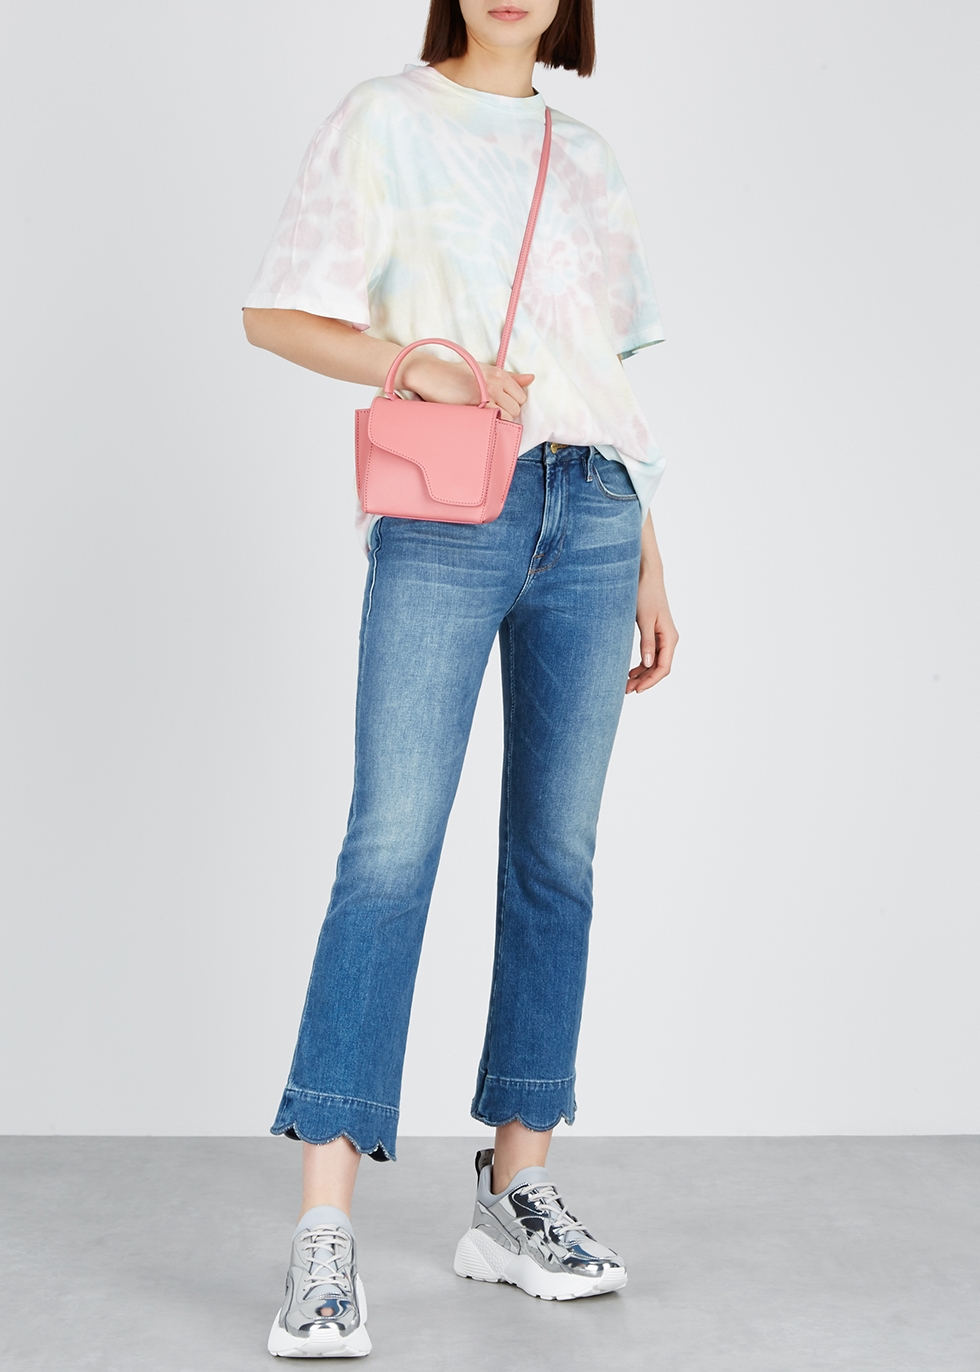 e7ef59abc0 Stella McCartney - Designer Bags